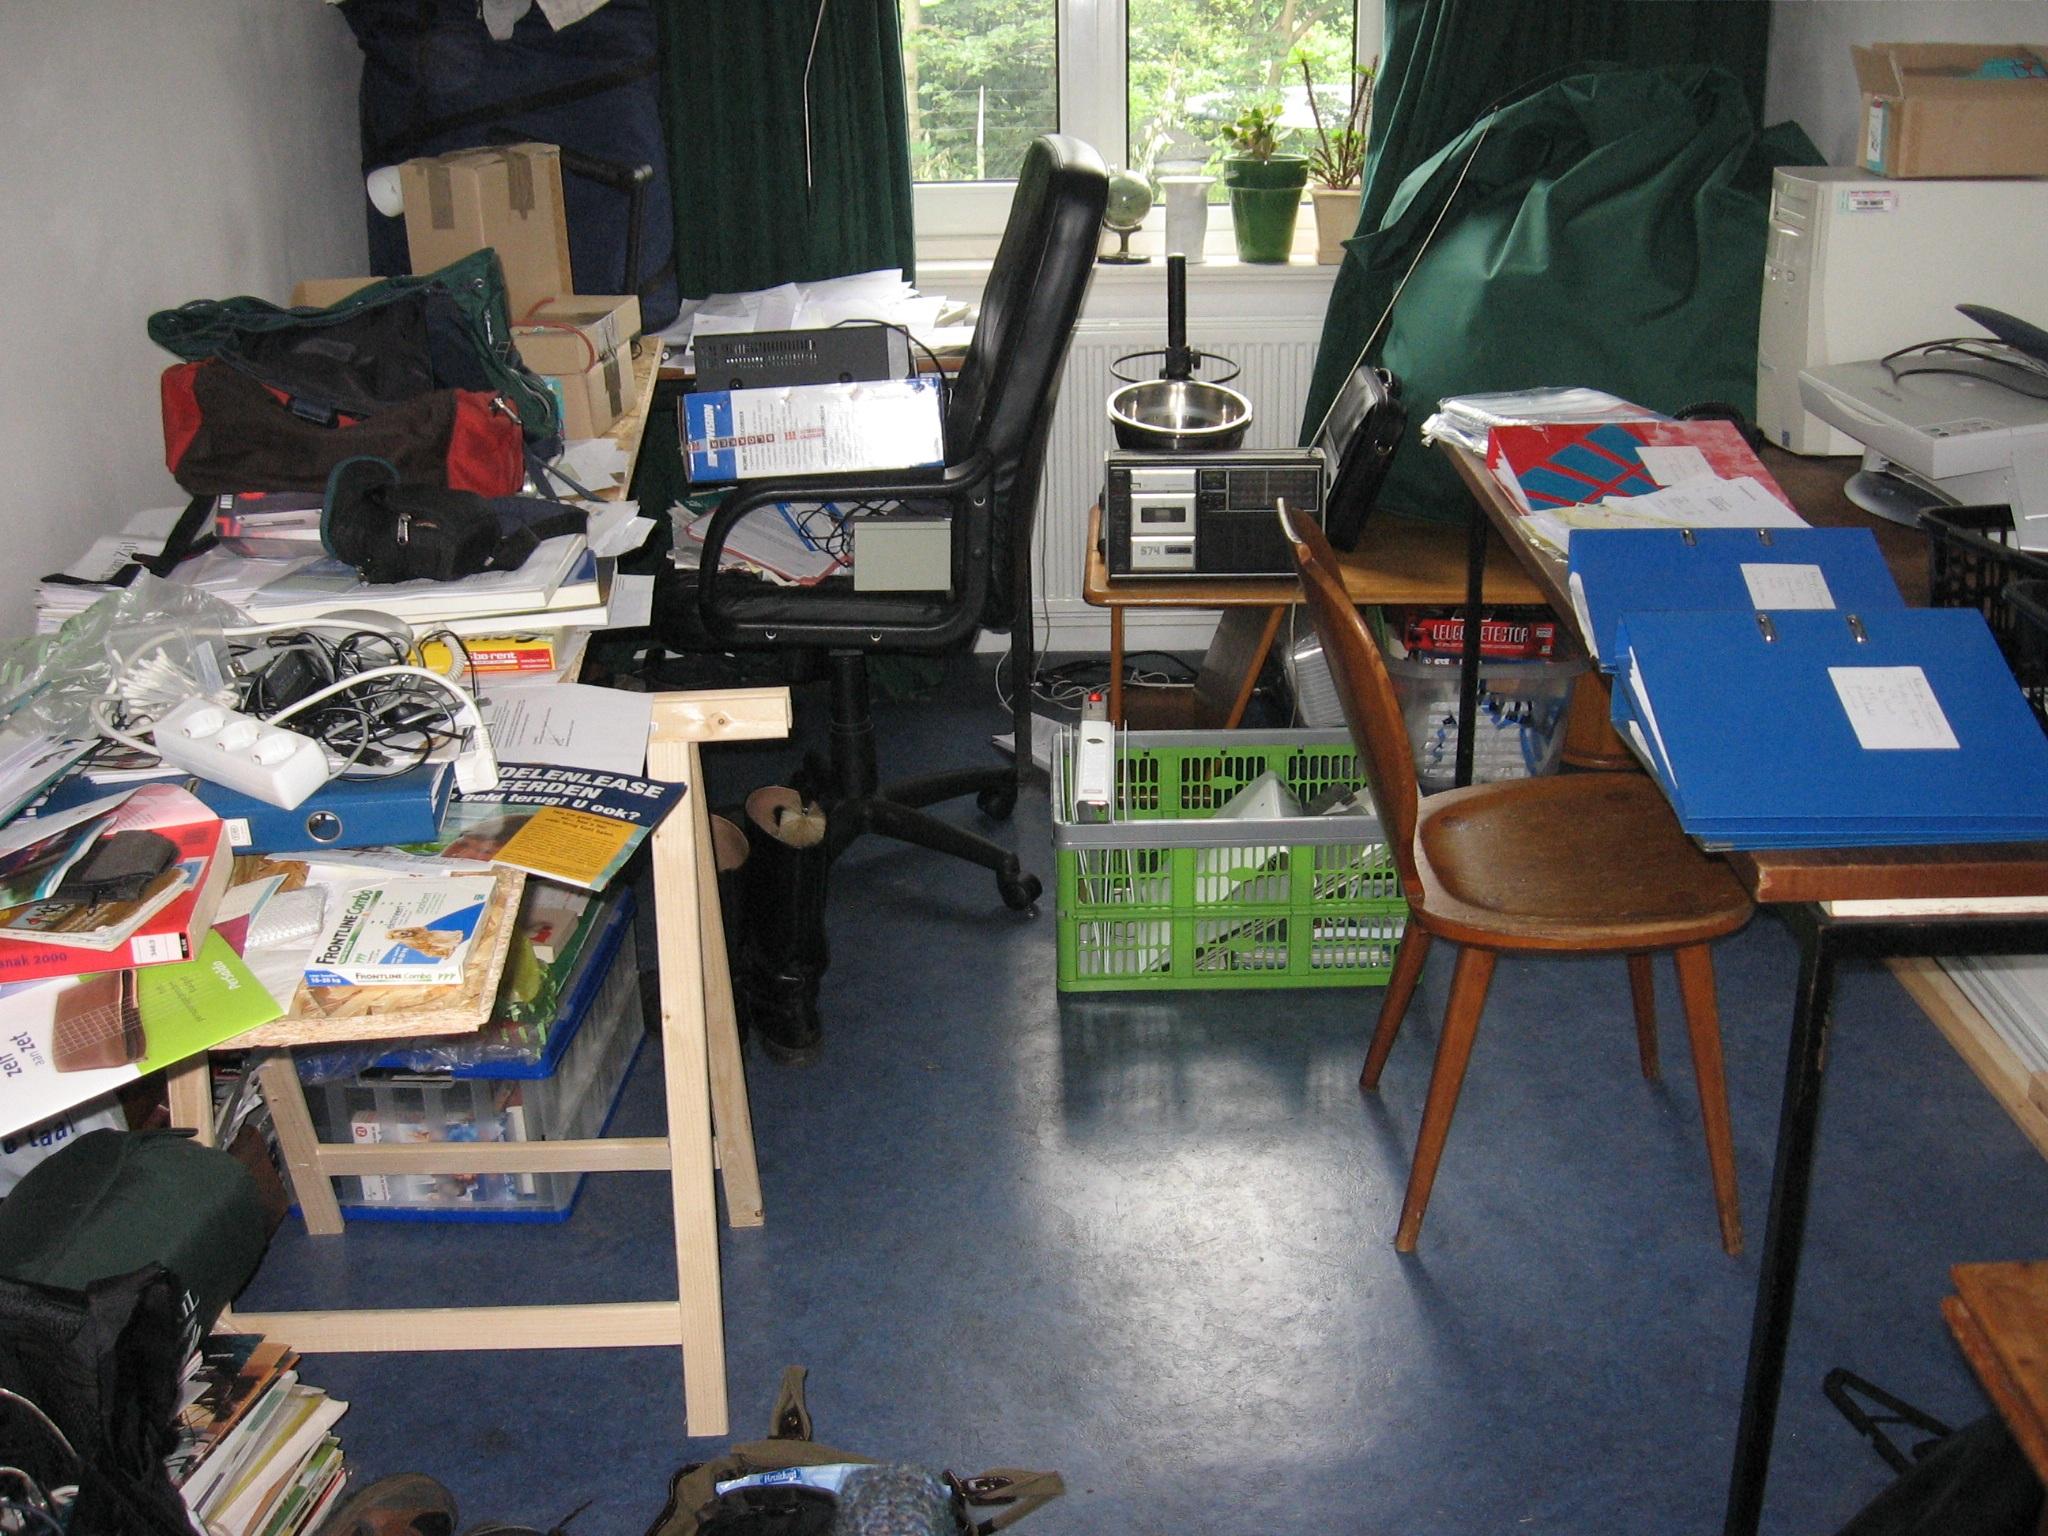 Woonkamer Met Kunst : Gratis afbeeldingen : werkplaats woonkamer kunst chaos rommel